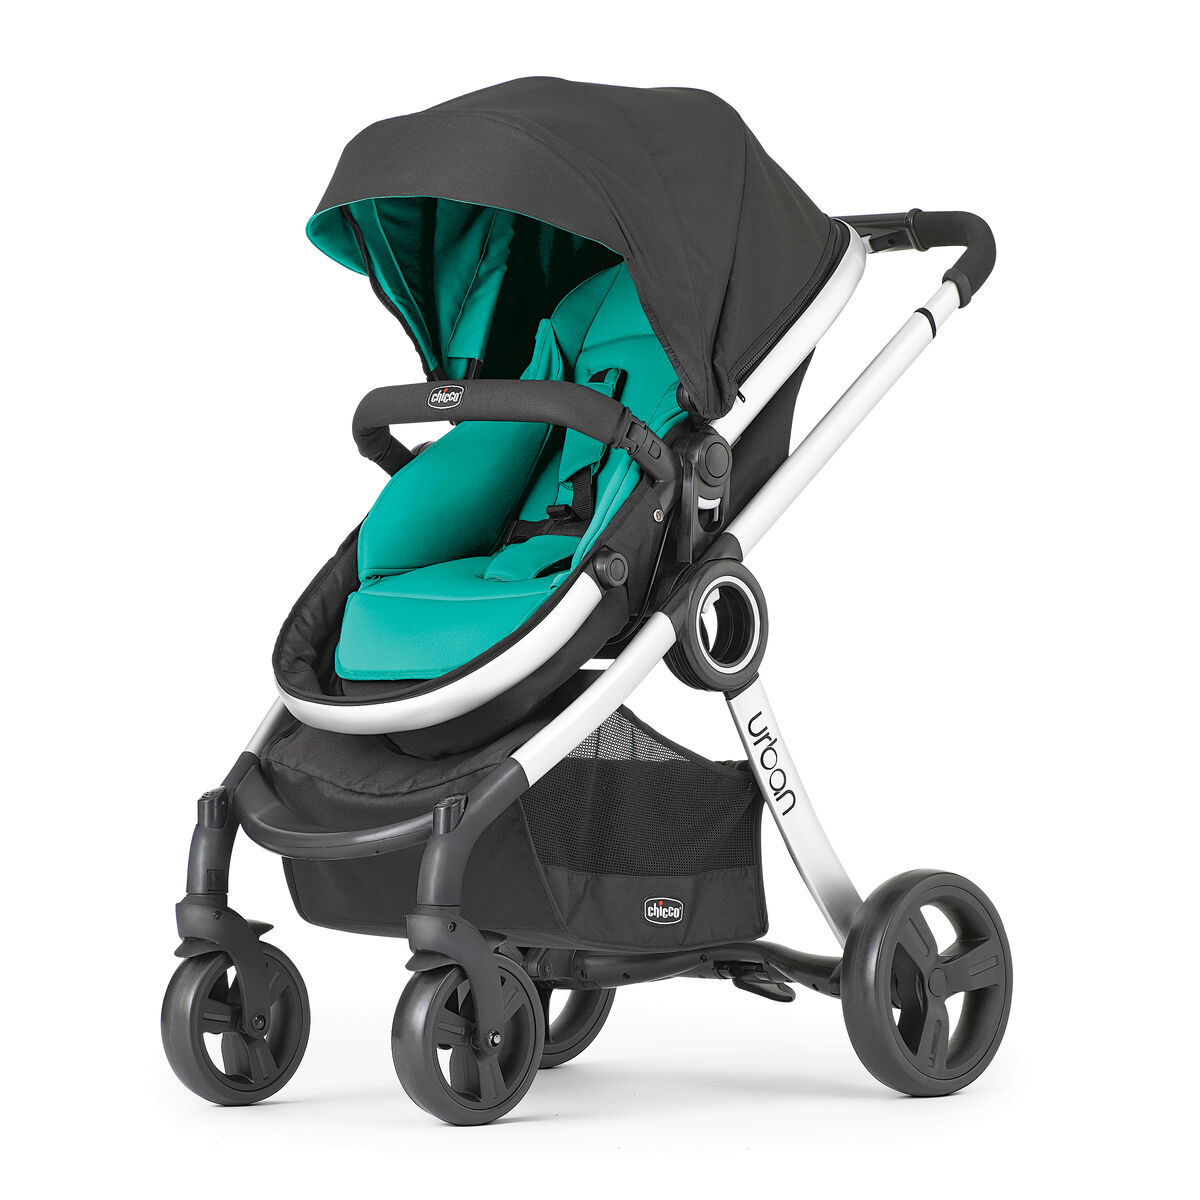 Urban 6 in 1 modular stroller emeraldurban 6 in 1 modular stroller emerald